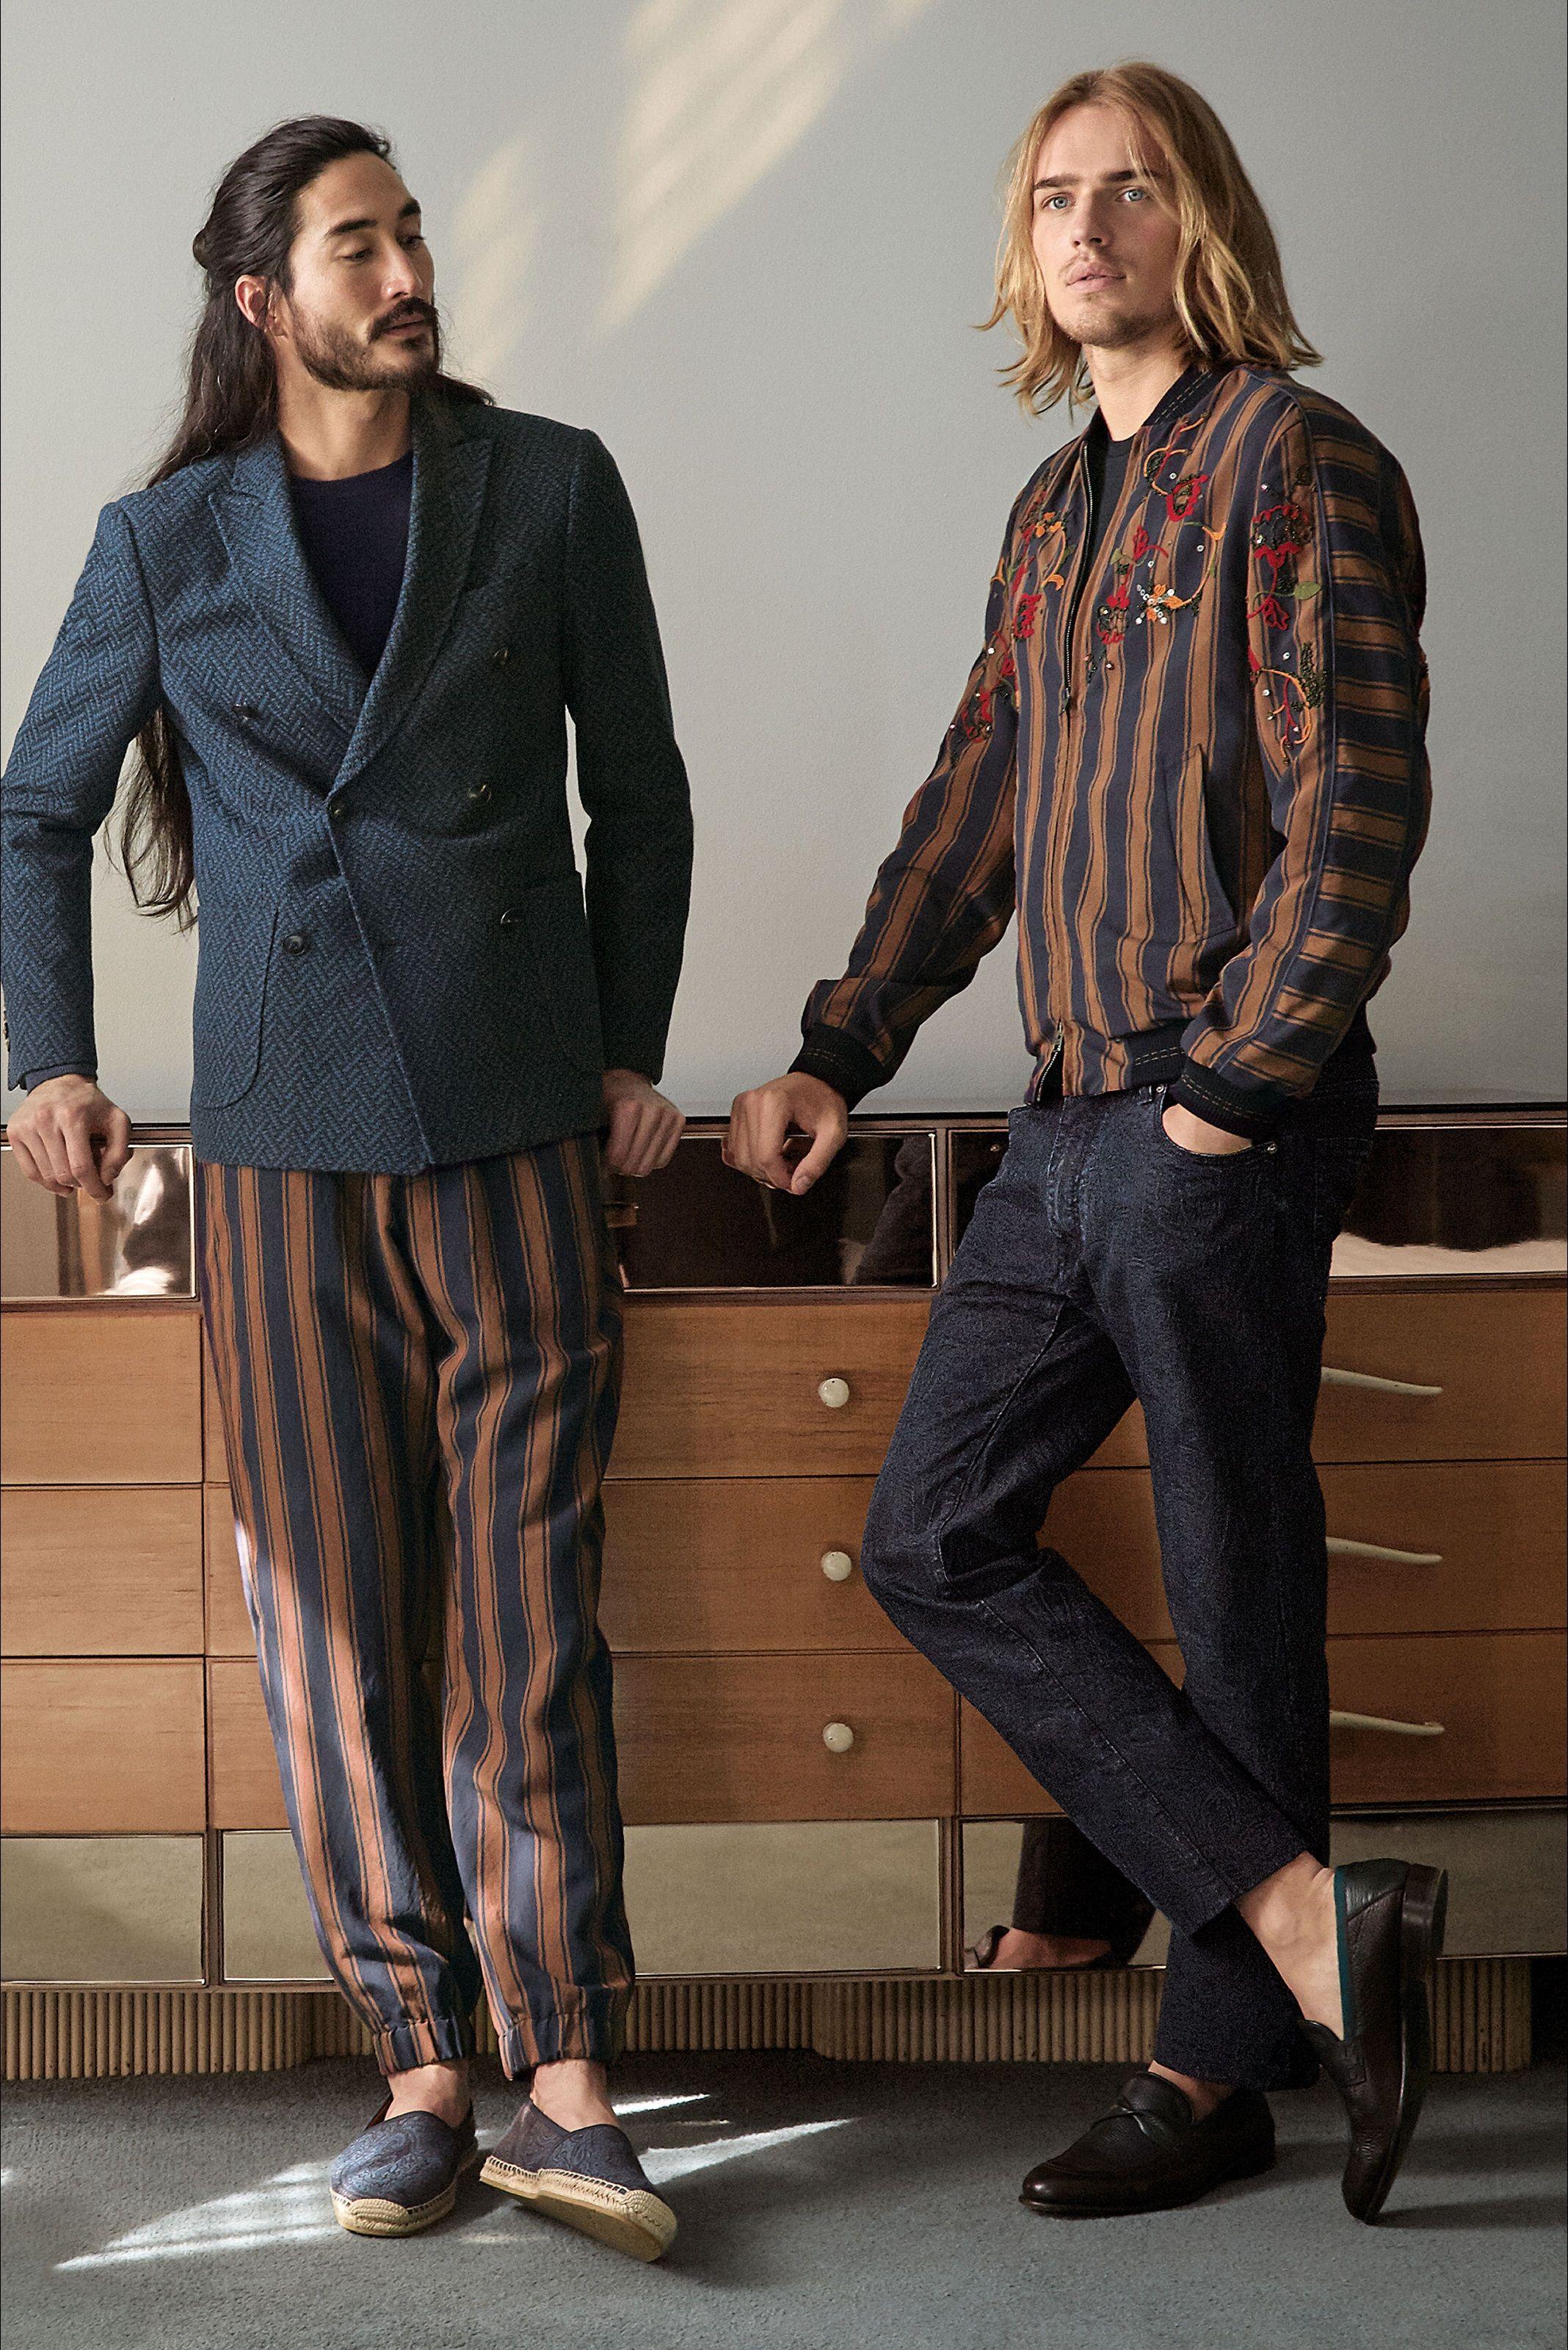 lowest price ba675 5d6fd Etro - Look 20 Pantaloni a righe verticali | Men's fashion ...